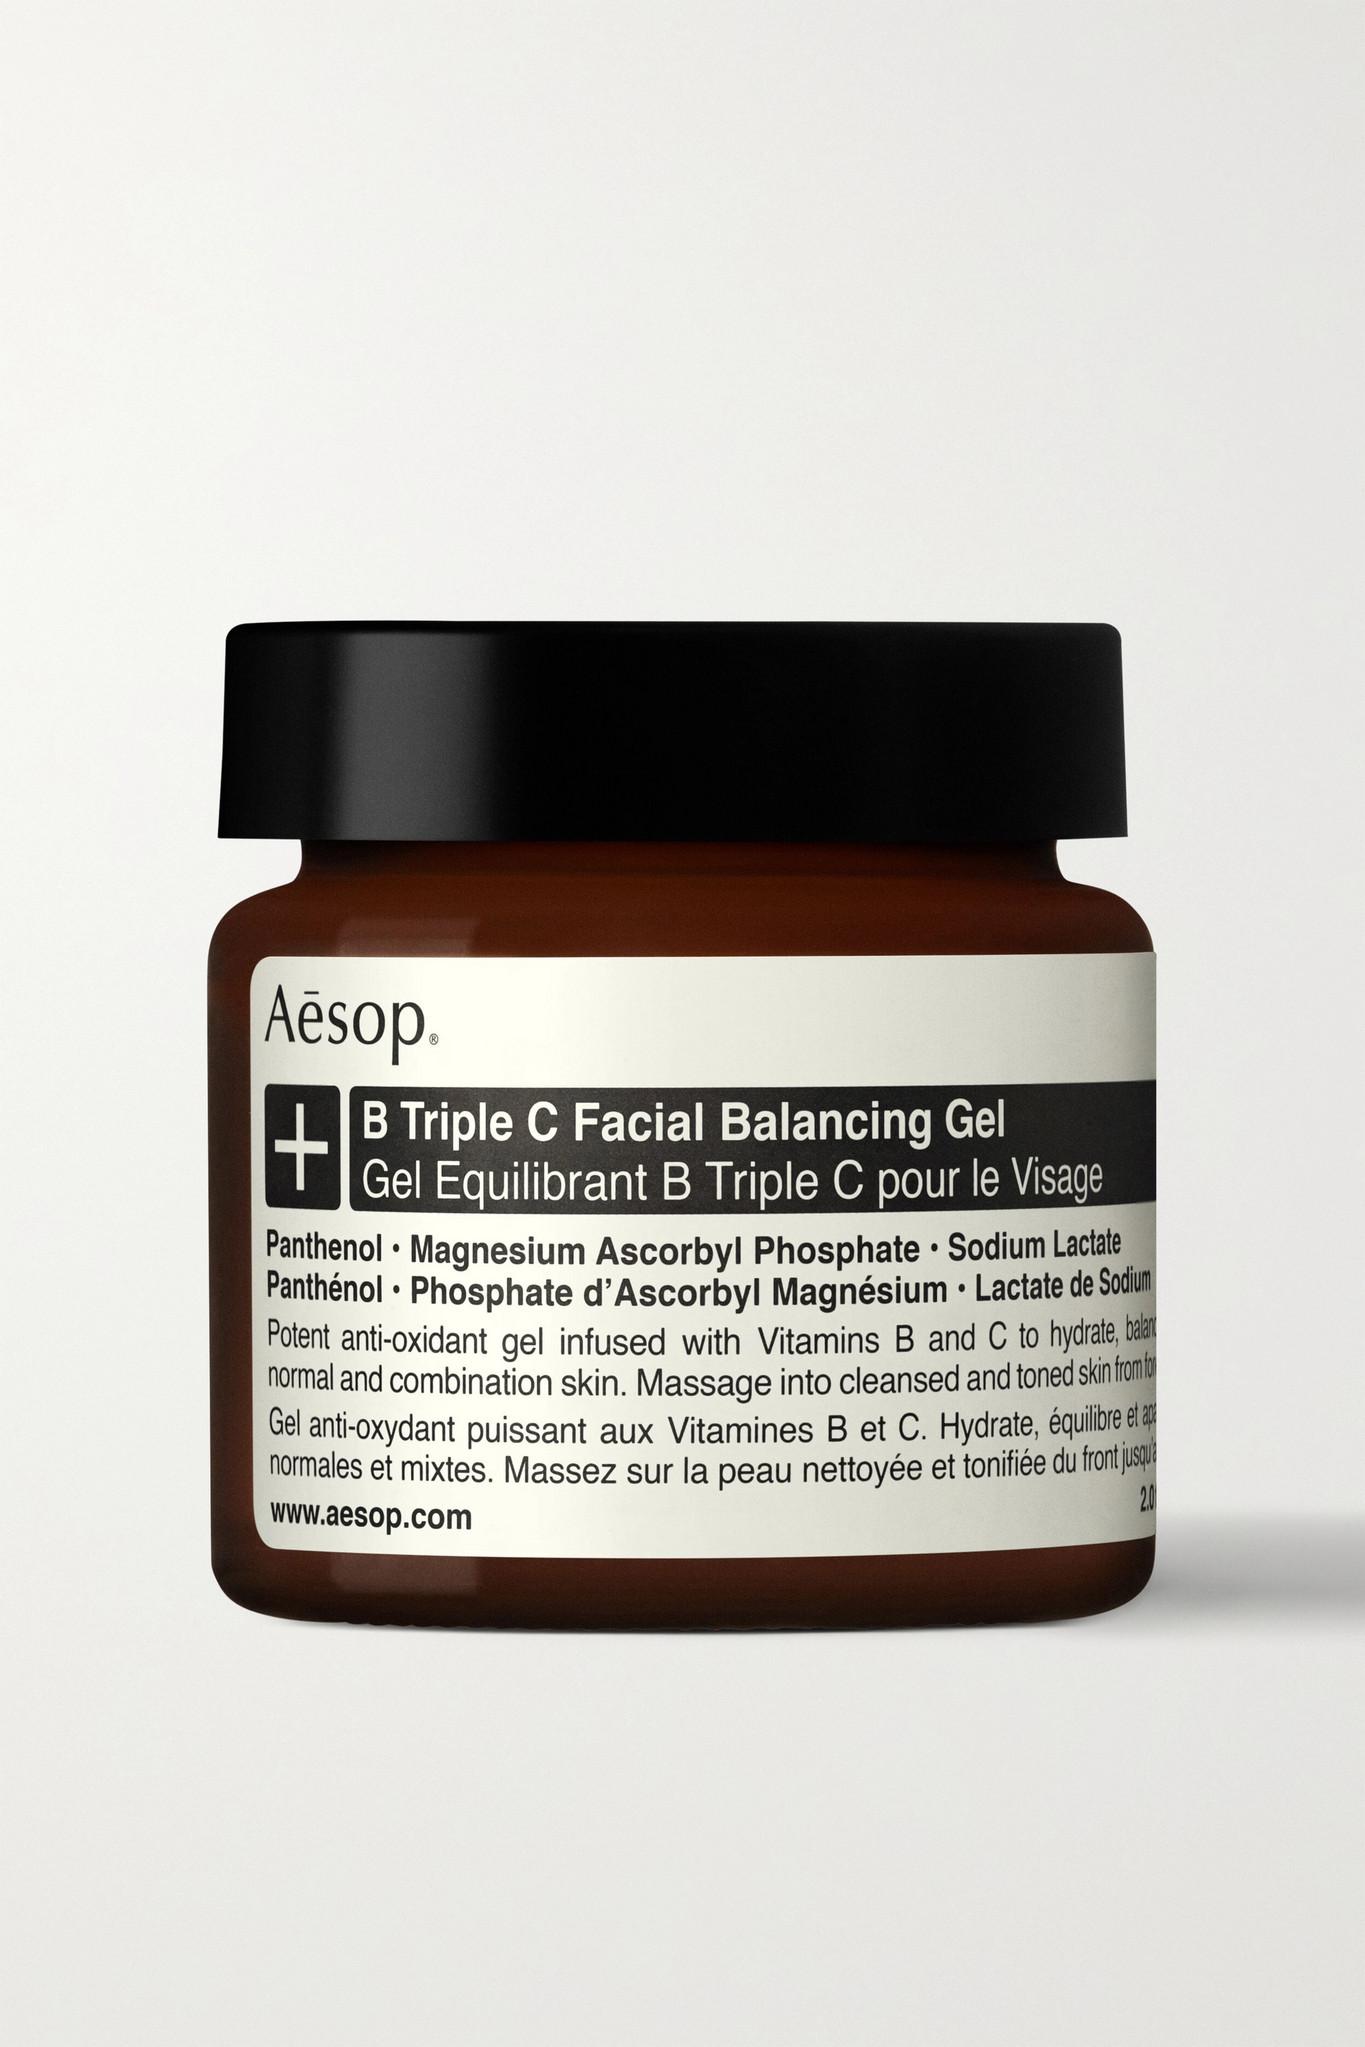 AESOP - B 三倍 C 肌肤调理凝露,60ml - 无色 - one size